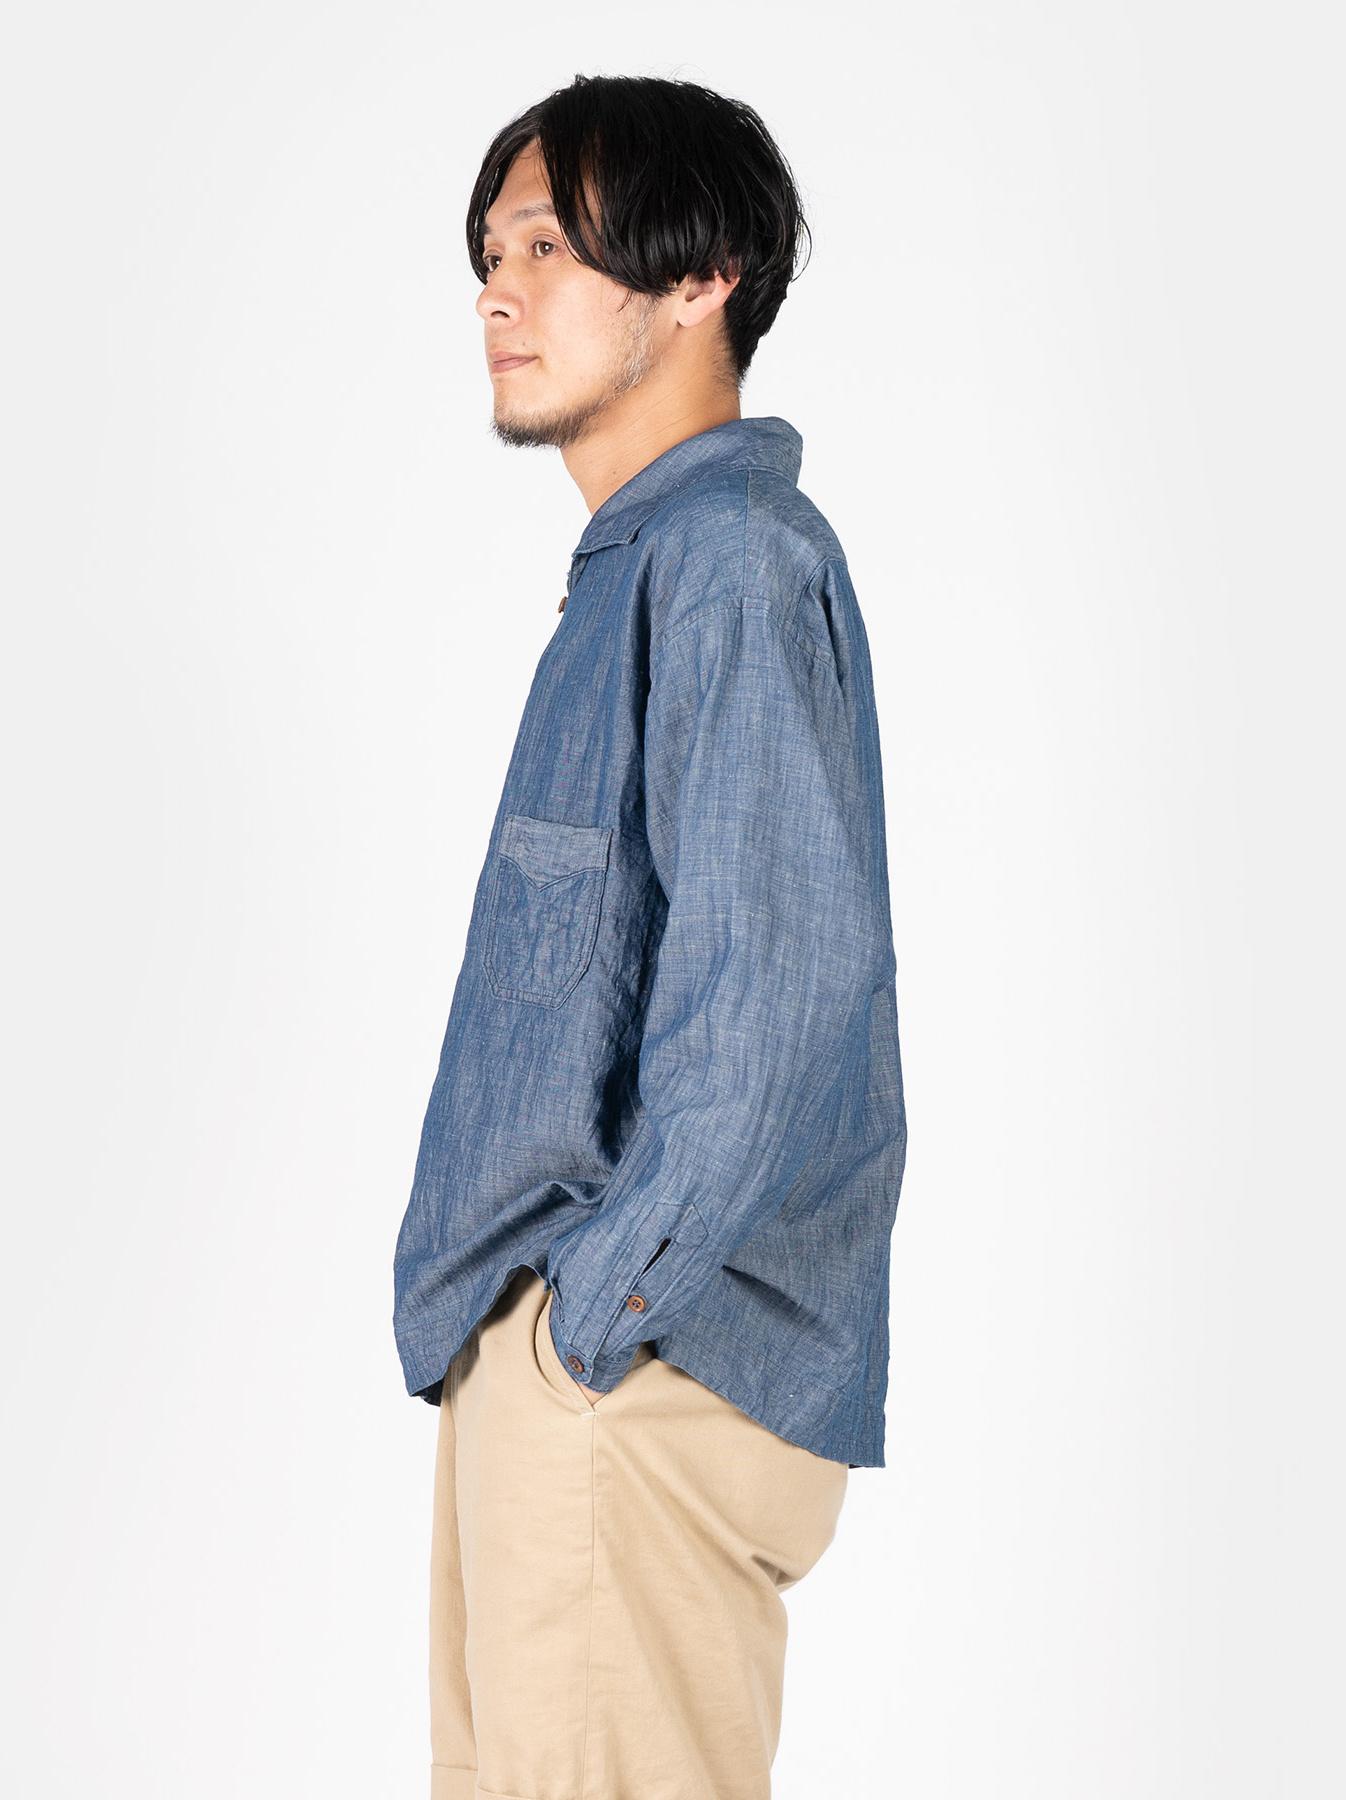 WH Cotton Linen Umahiko Pullover Shirt-4